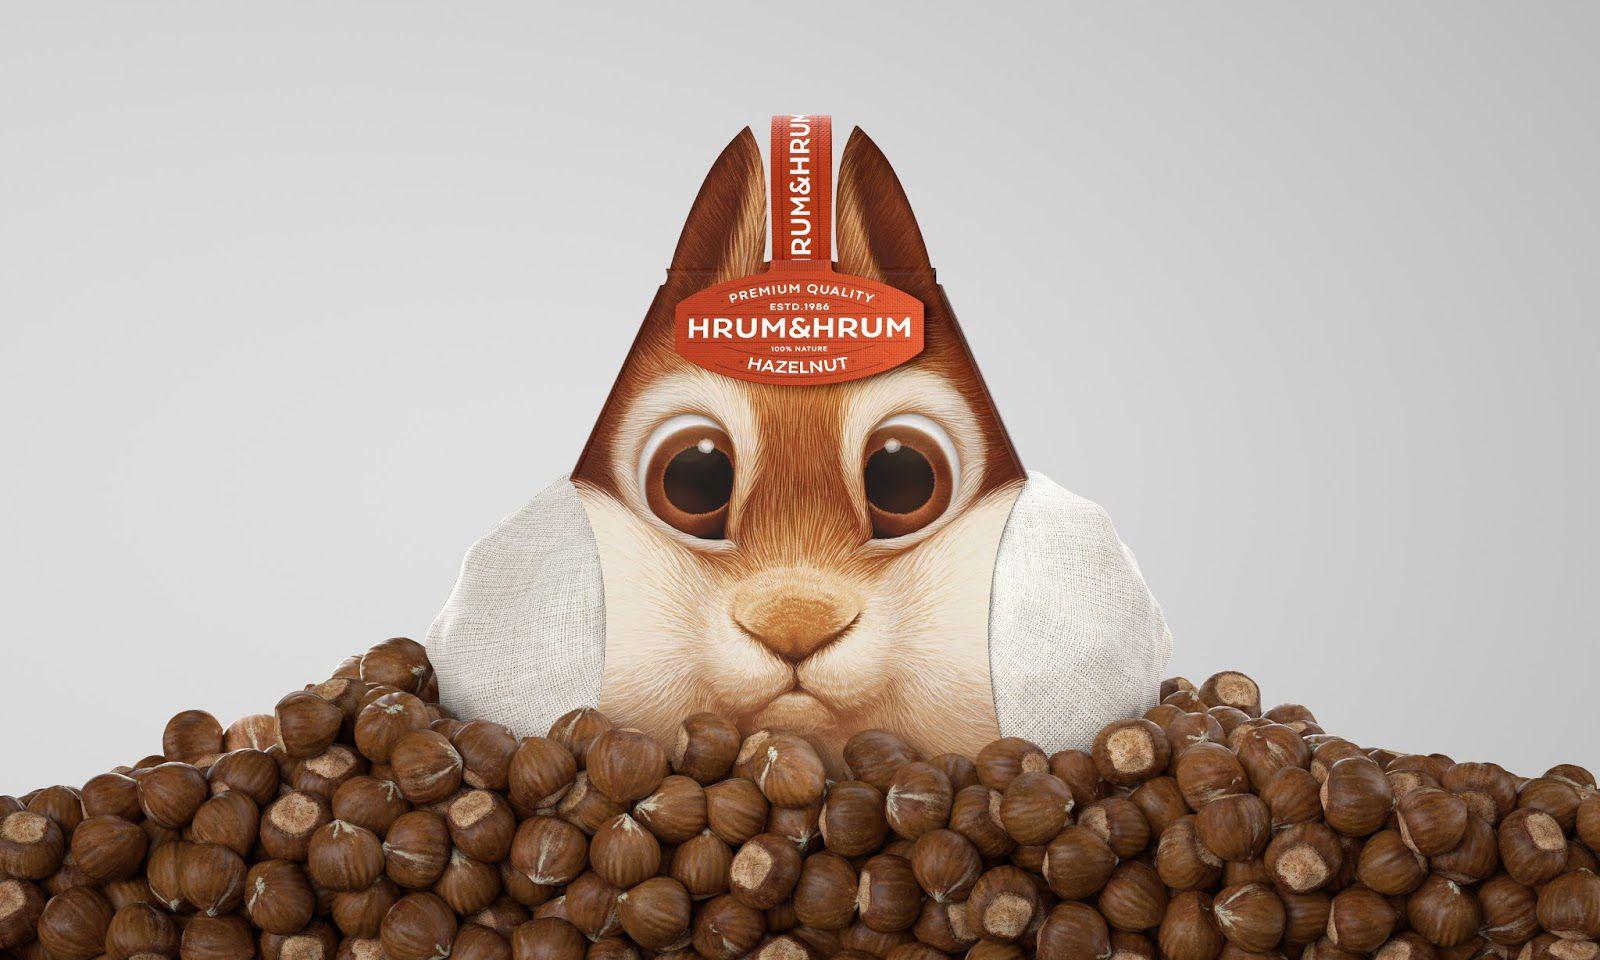 Hrum&Hrum (noisettes) I Design : Constantin Bolimond, Minsk, Biélorussie (juillet 2020)